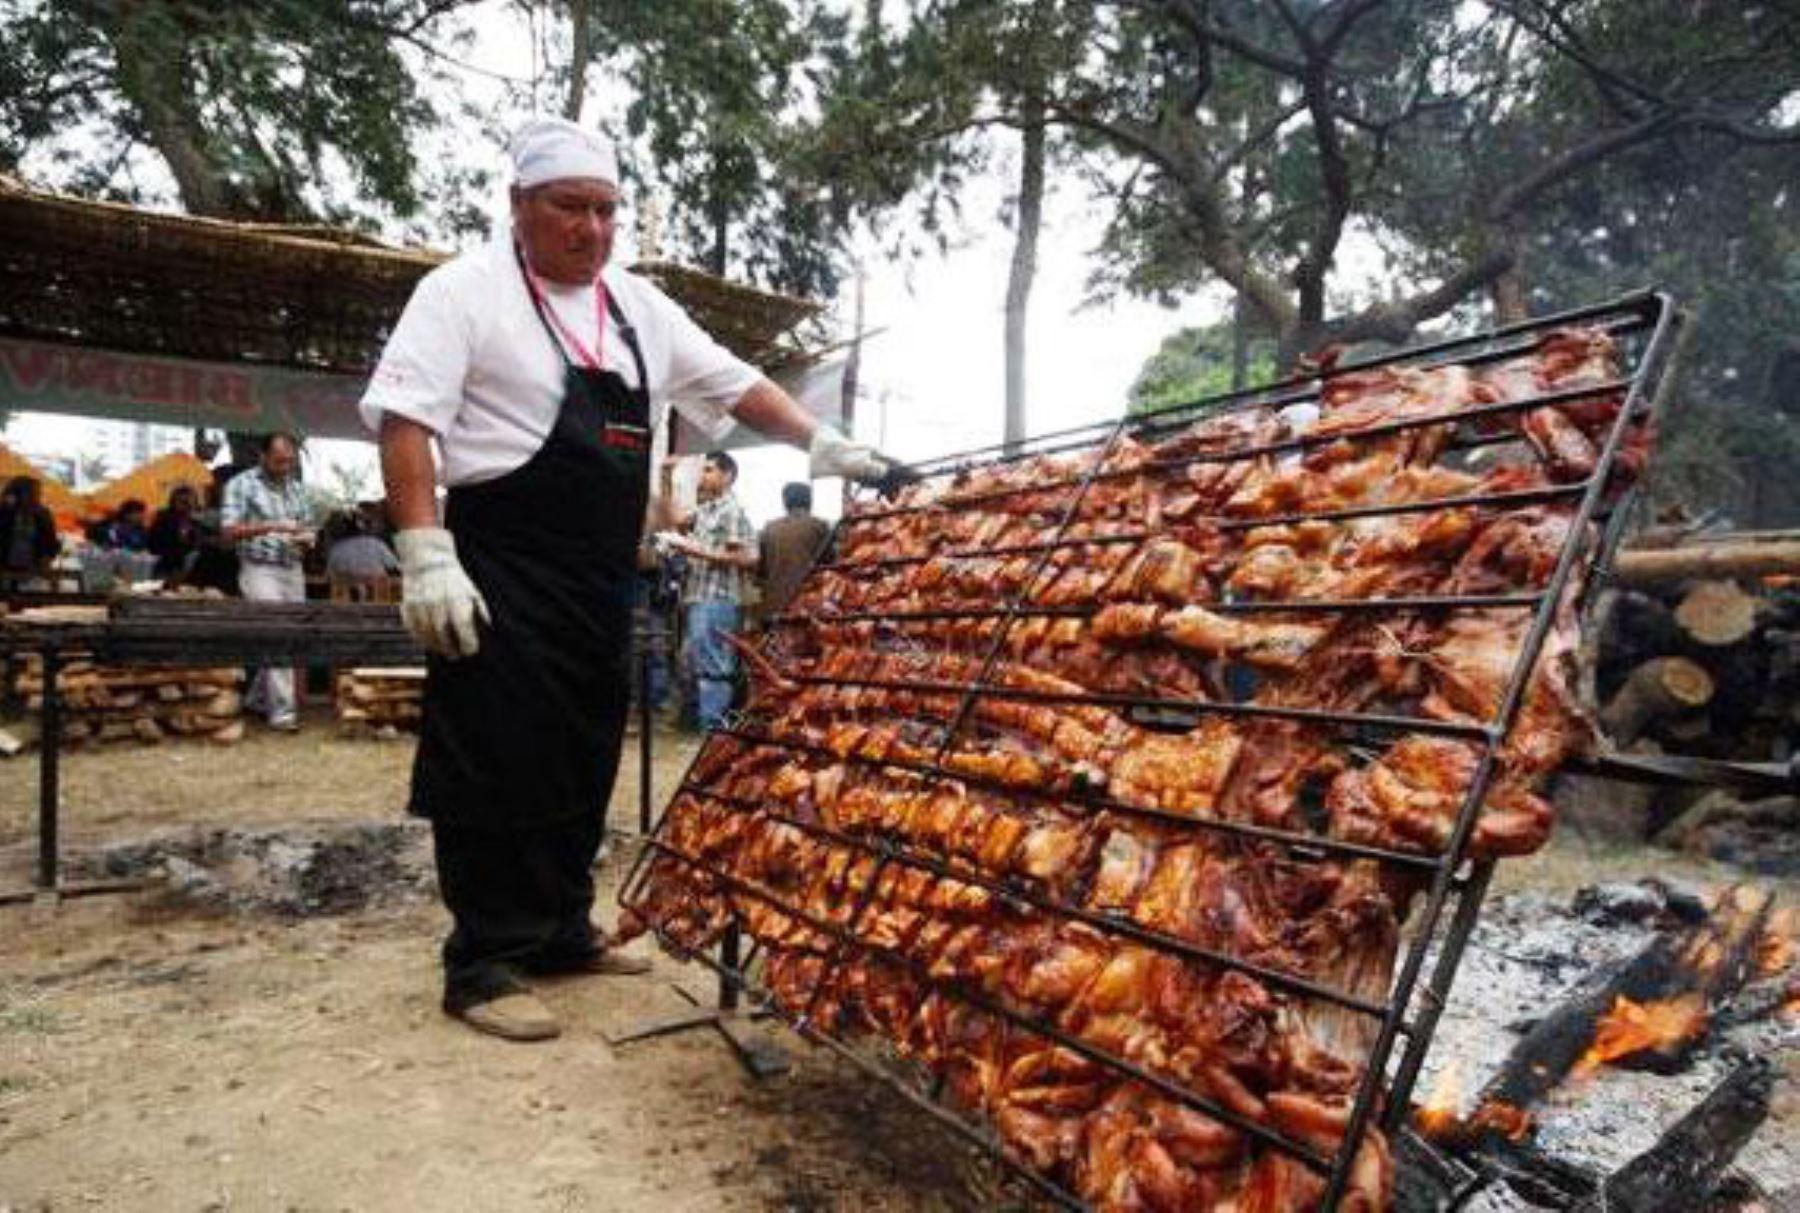 Festival de chancho al palo: Huaral se prepara para recibir a miles de turistas